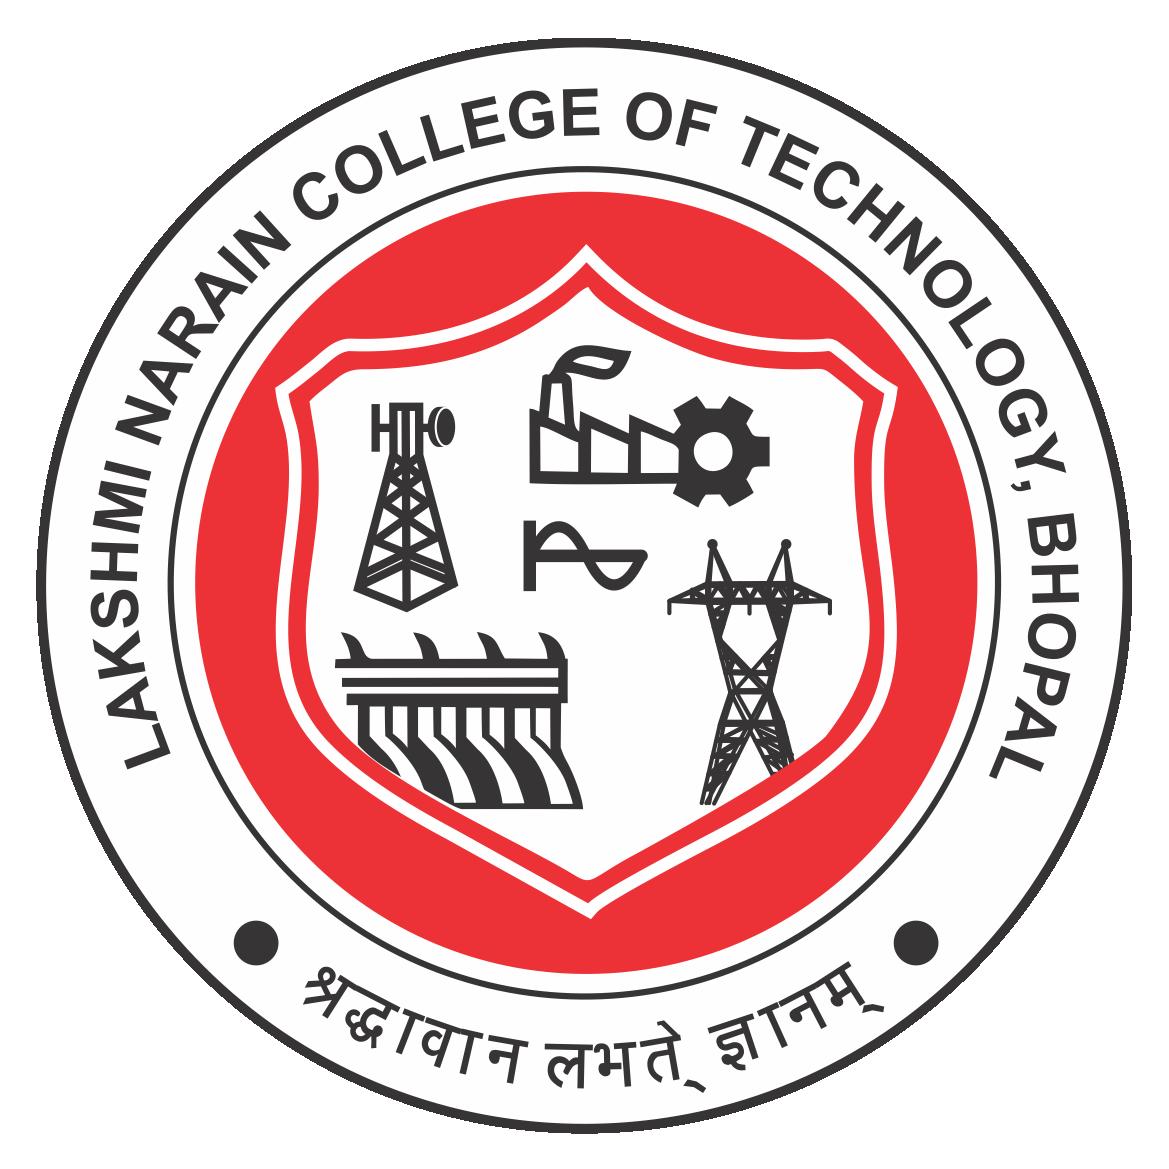 lakshmi narain college of technology edutrics